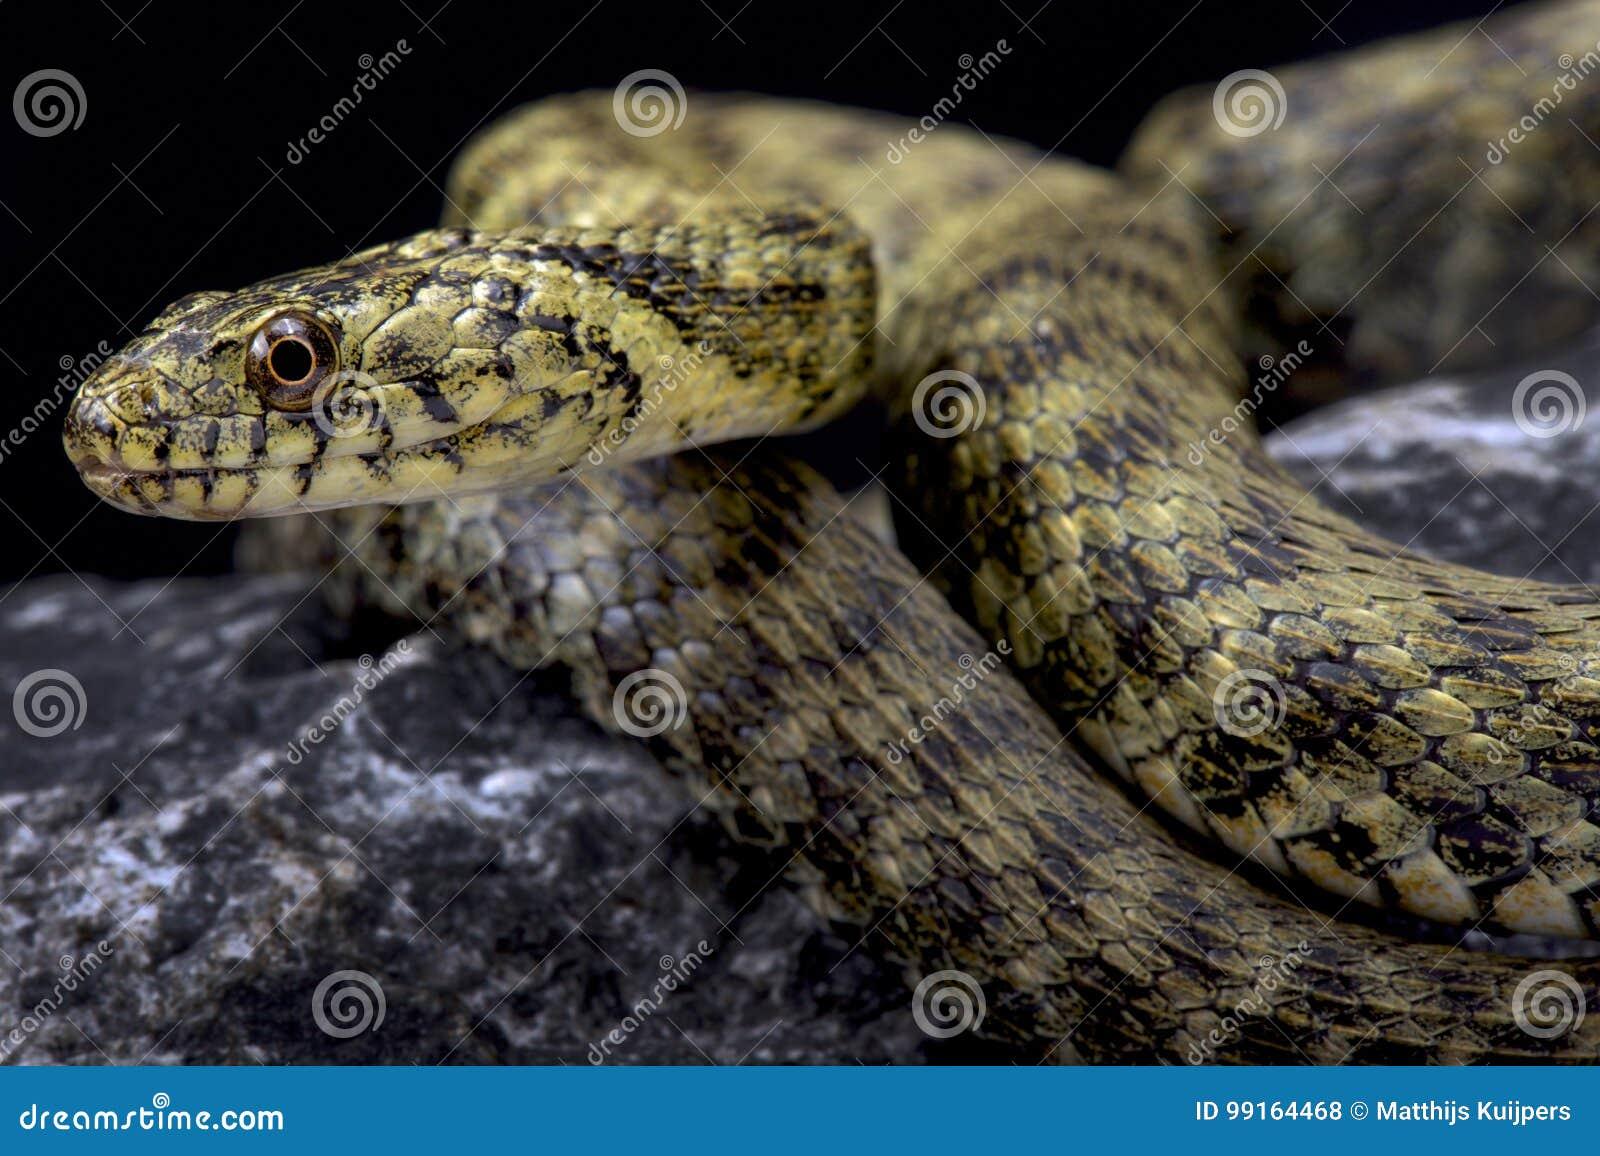 Dice snake, Natrix tessellata